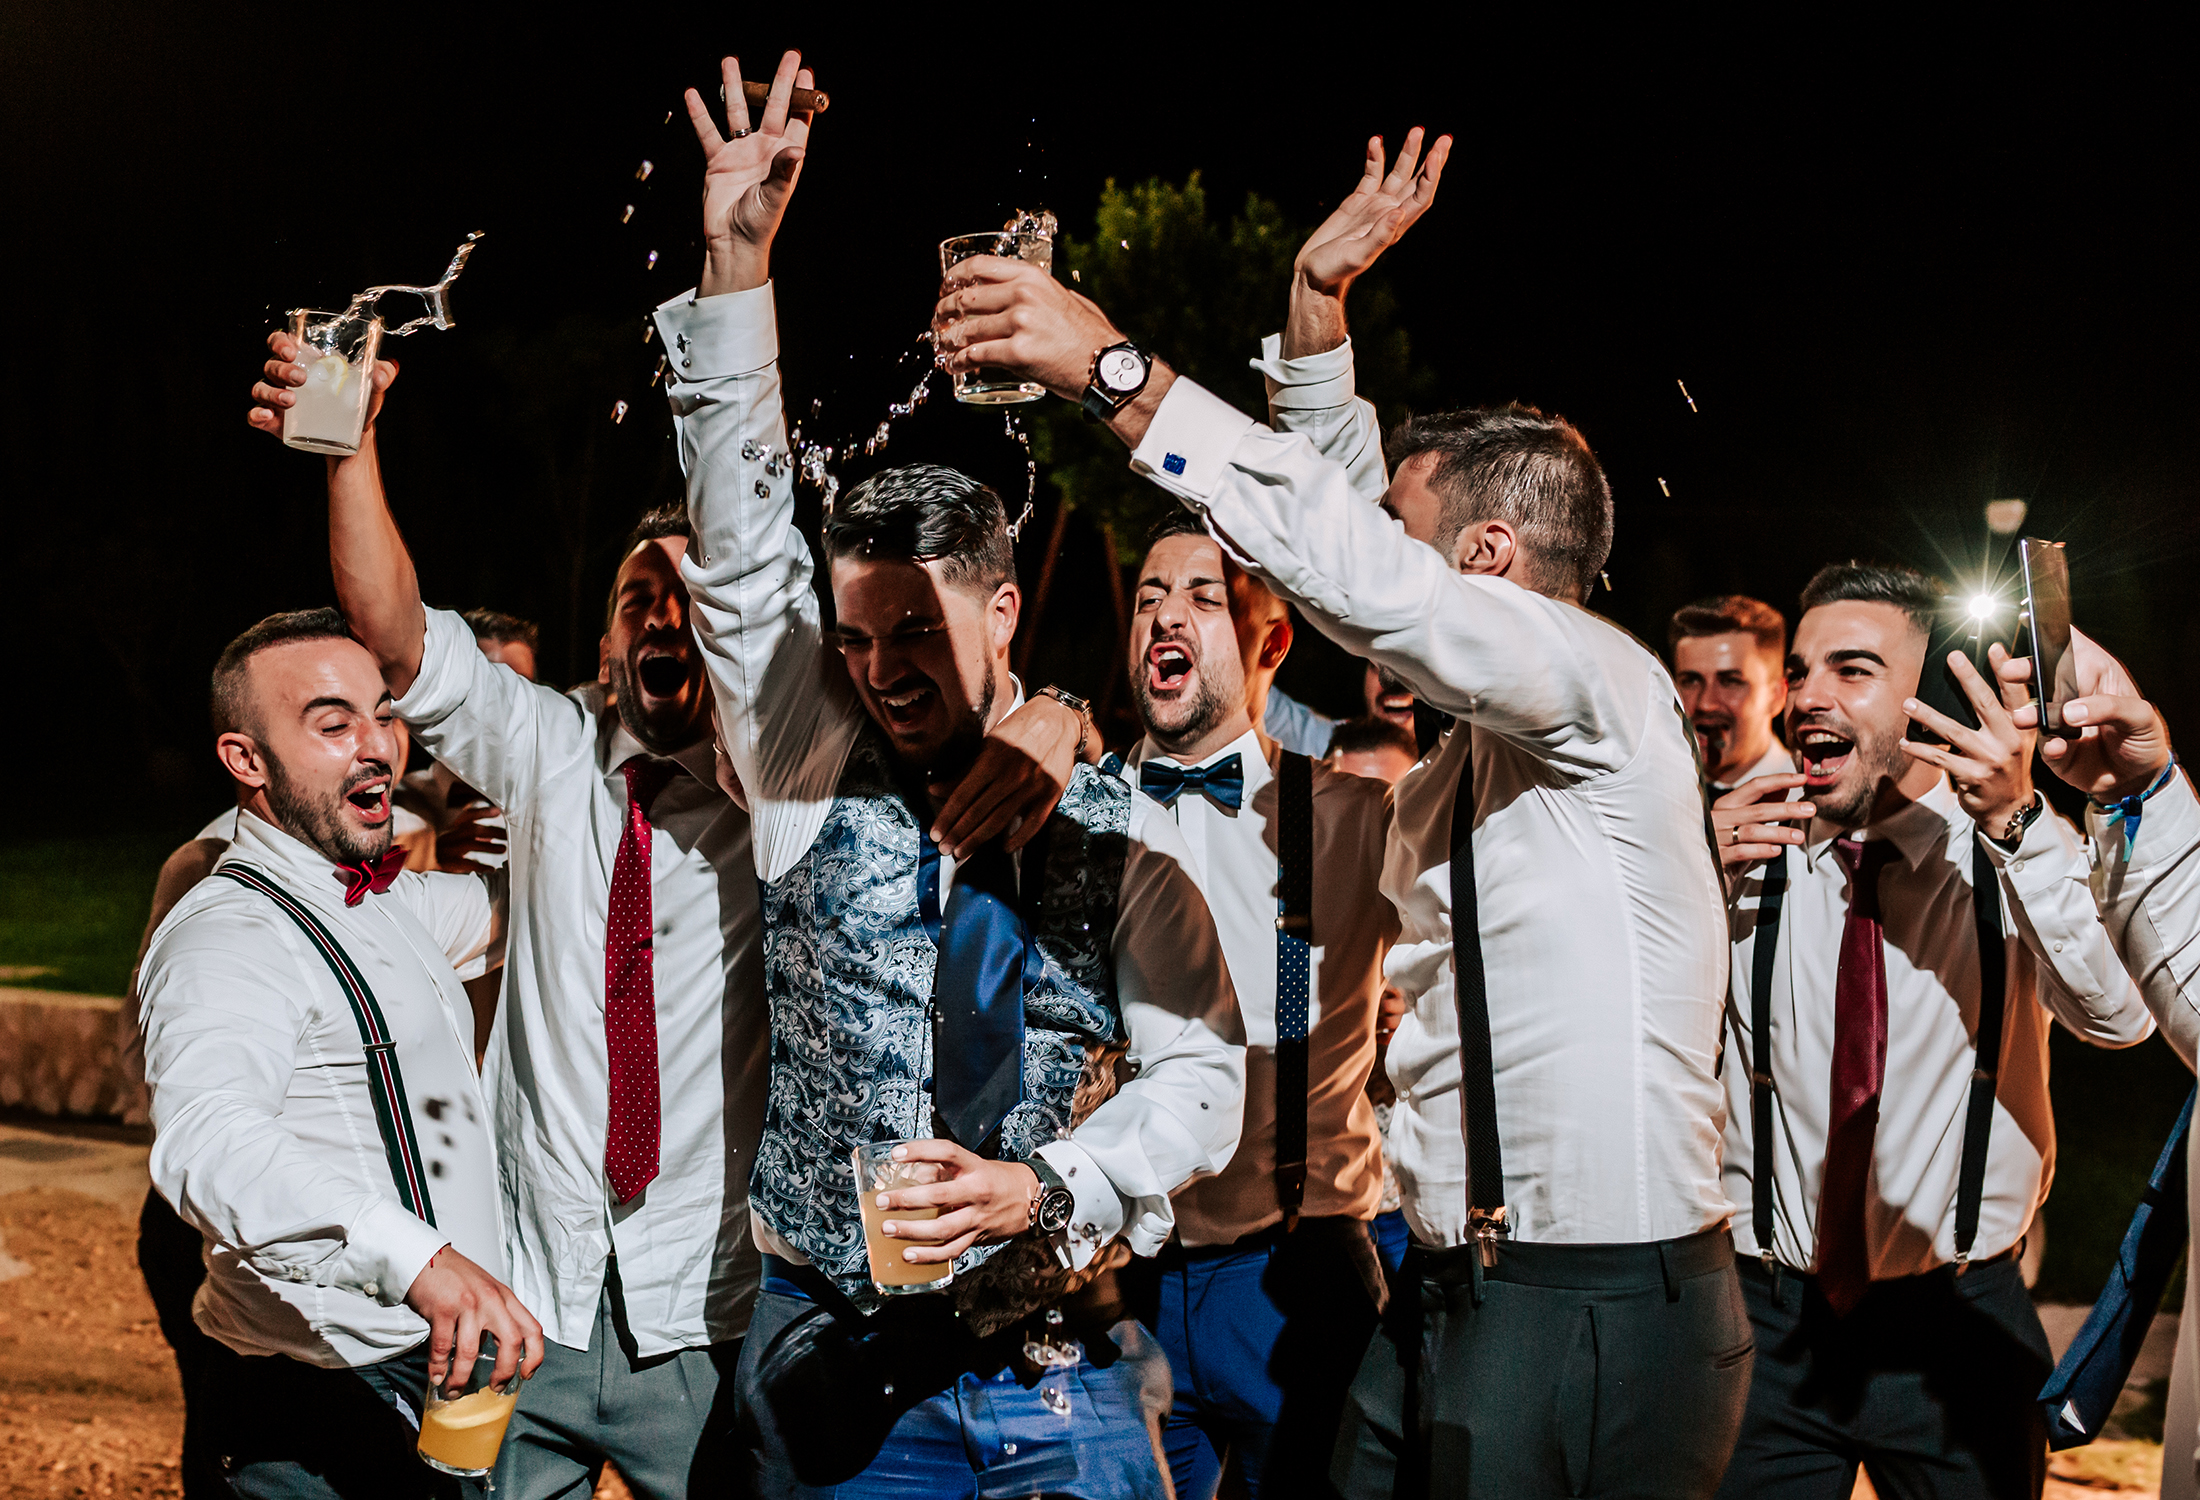 fiesta barra libre boda en bodega heretat de cesilia novelda